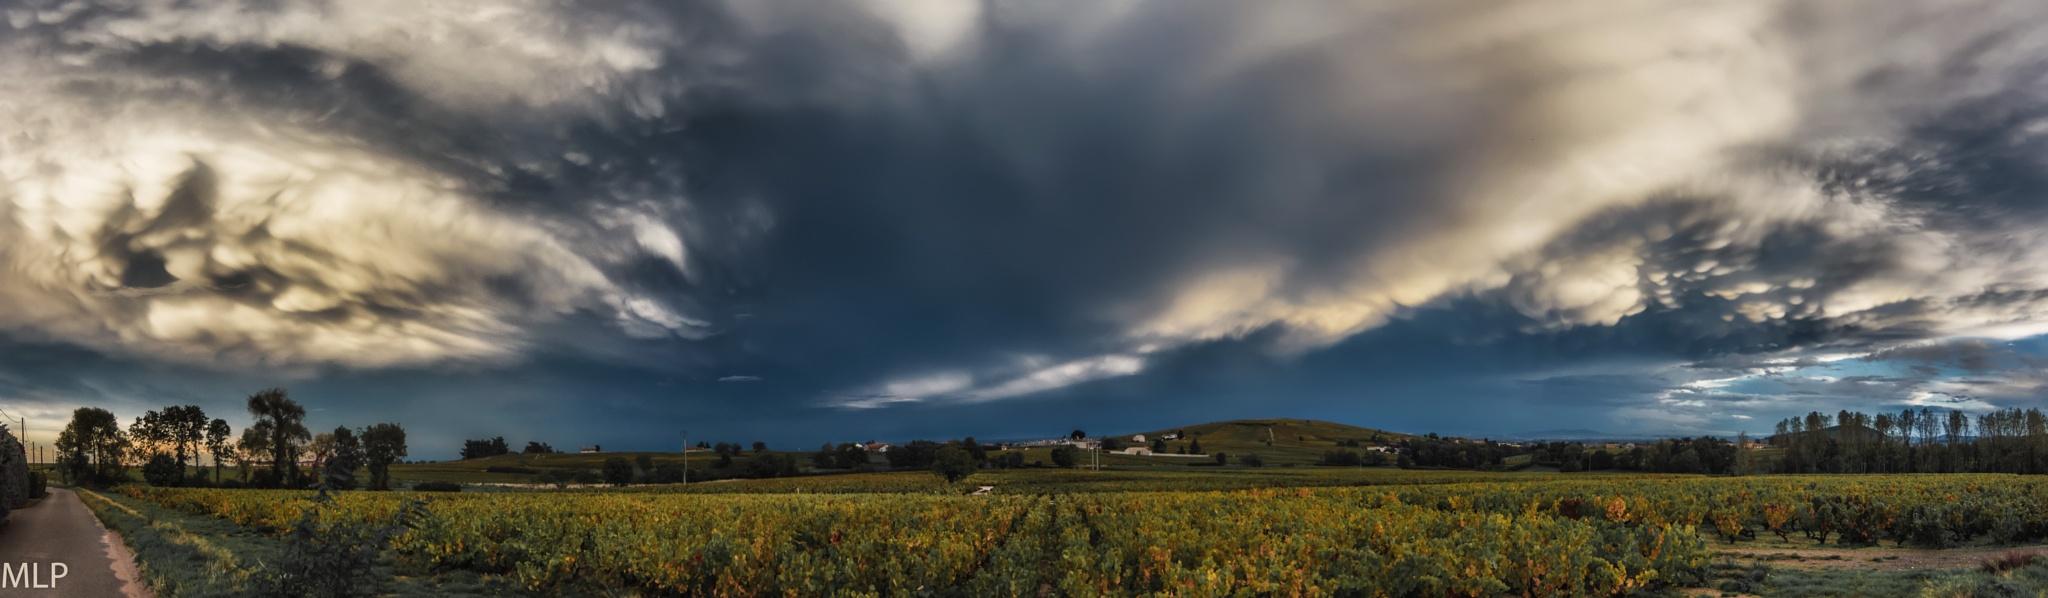 Apocalypse Sky by Milore